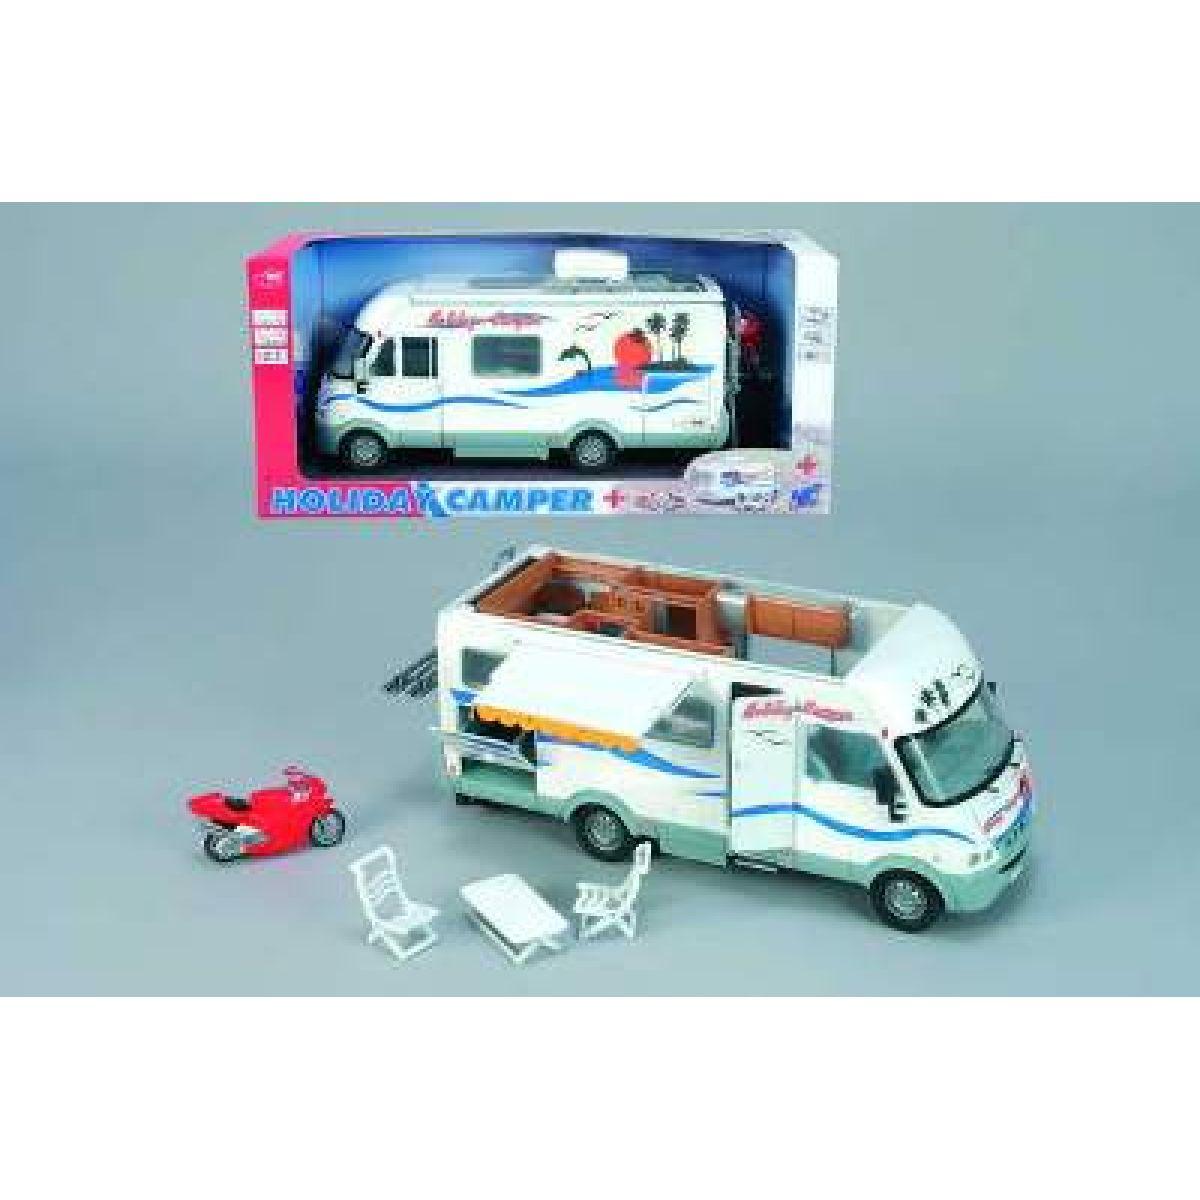 Dickie D 3314847 - Holiday Camper, obytné auto na setrvačník